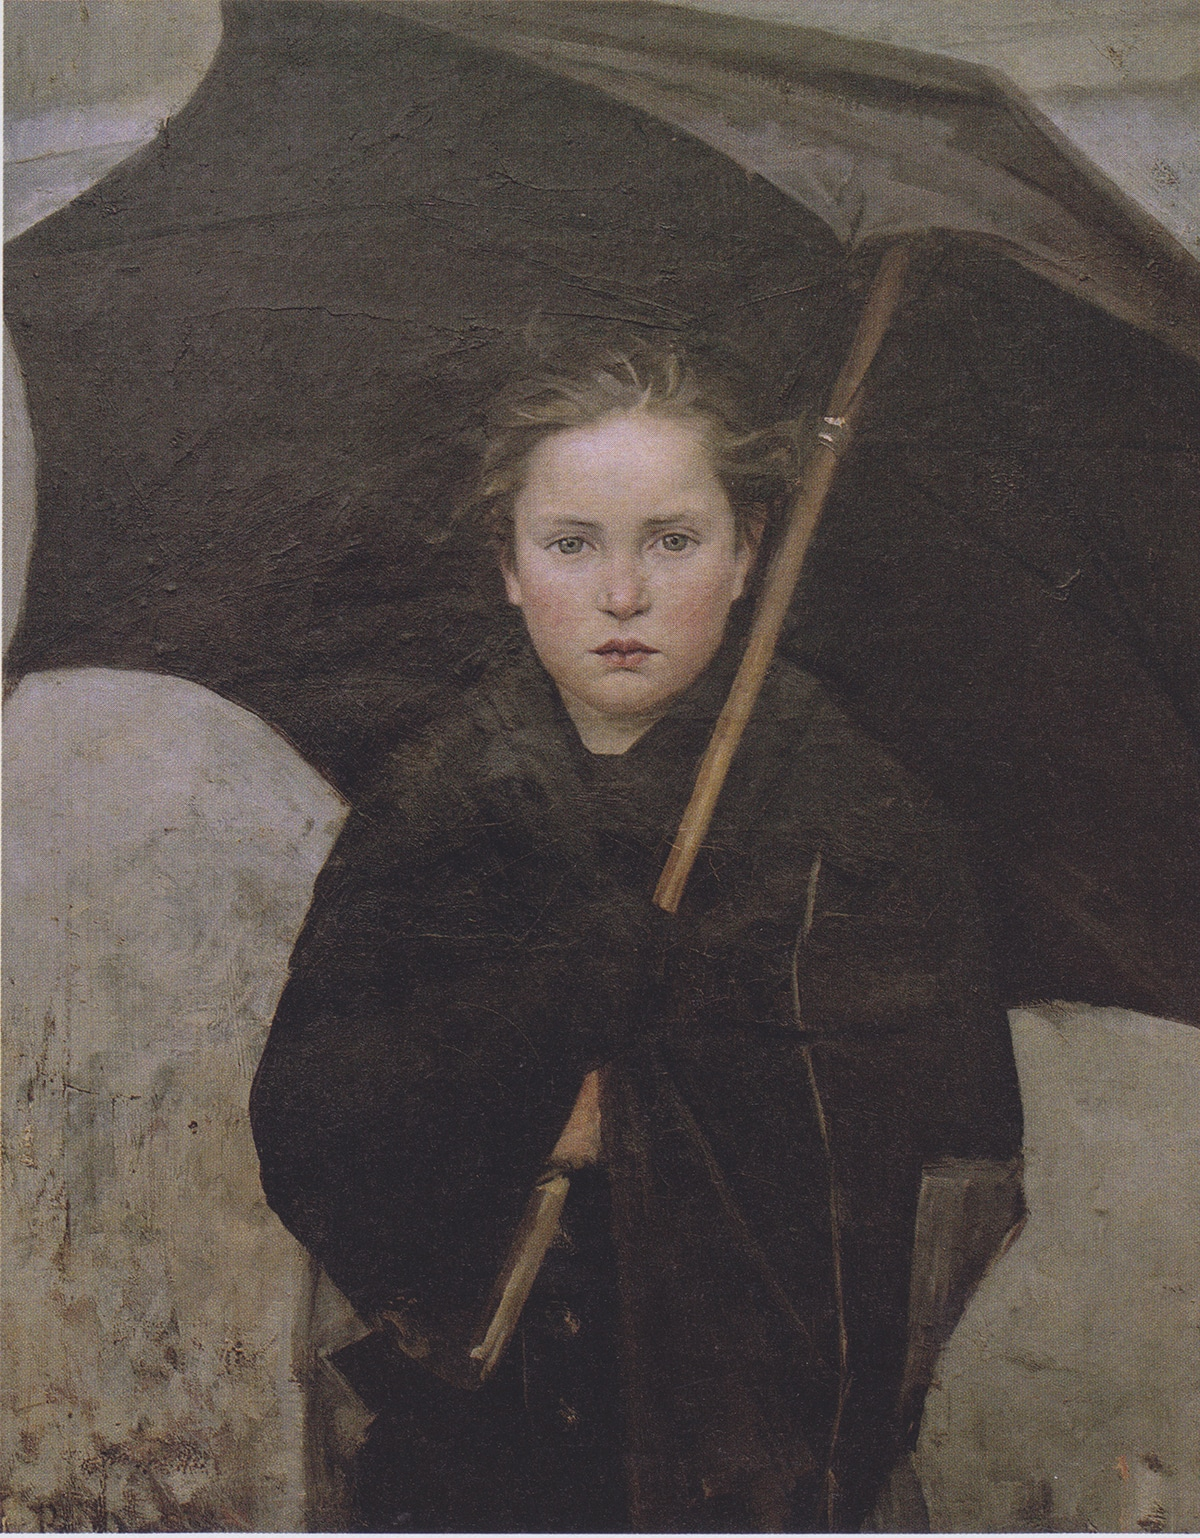 Marie Bashkirtseff, The Umbrella, 1883